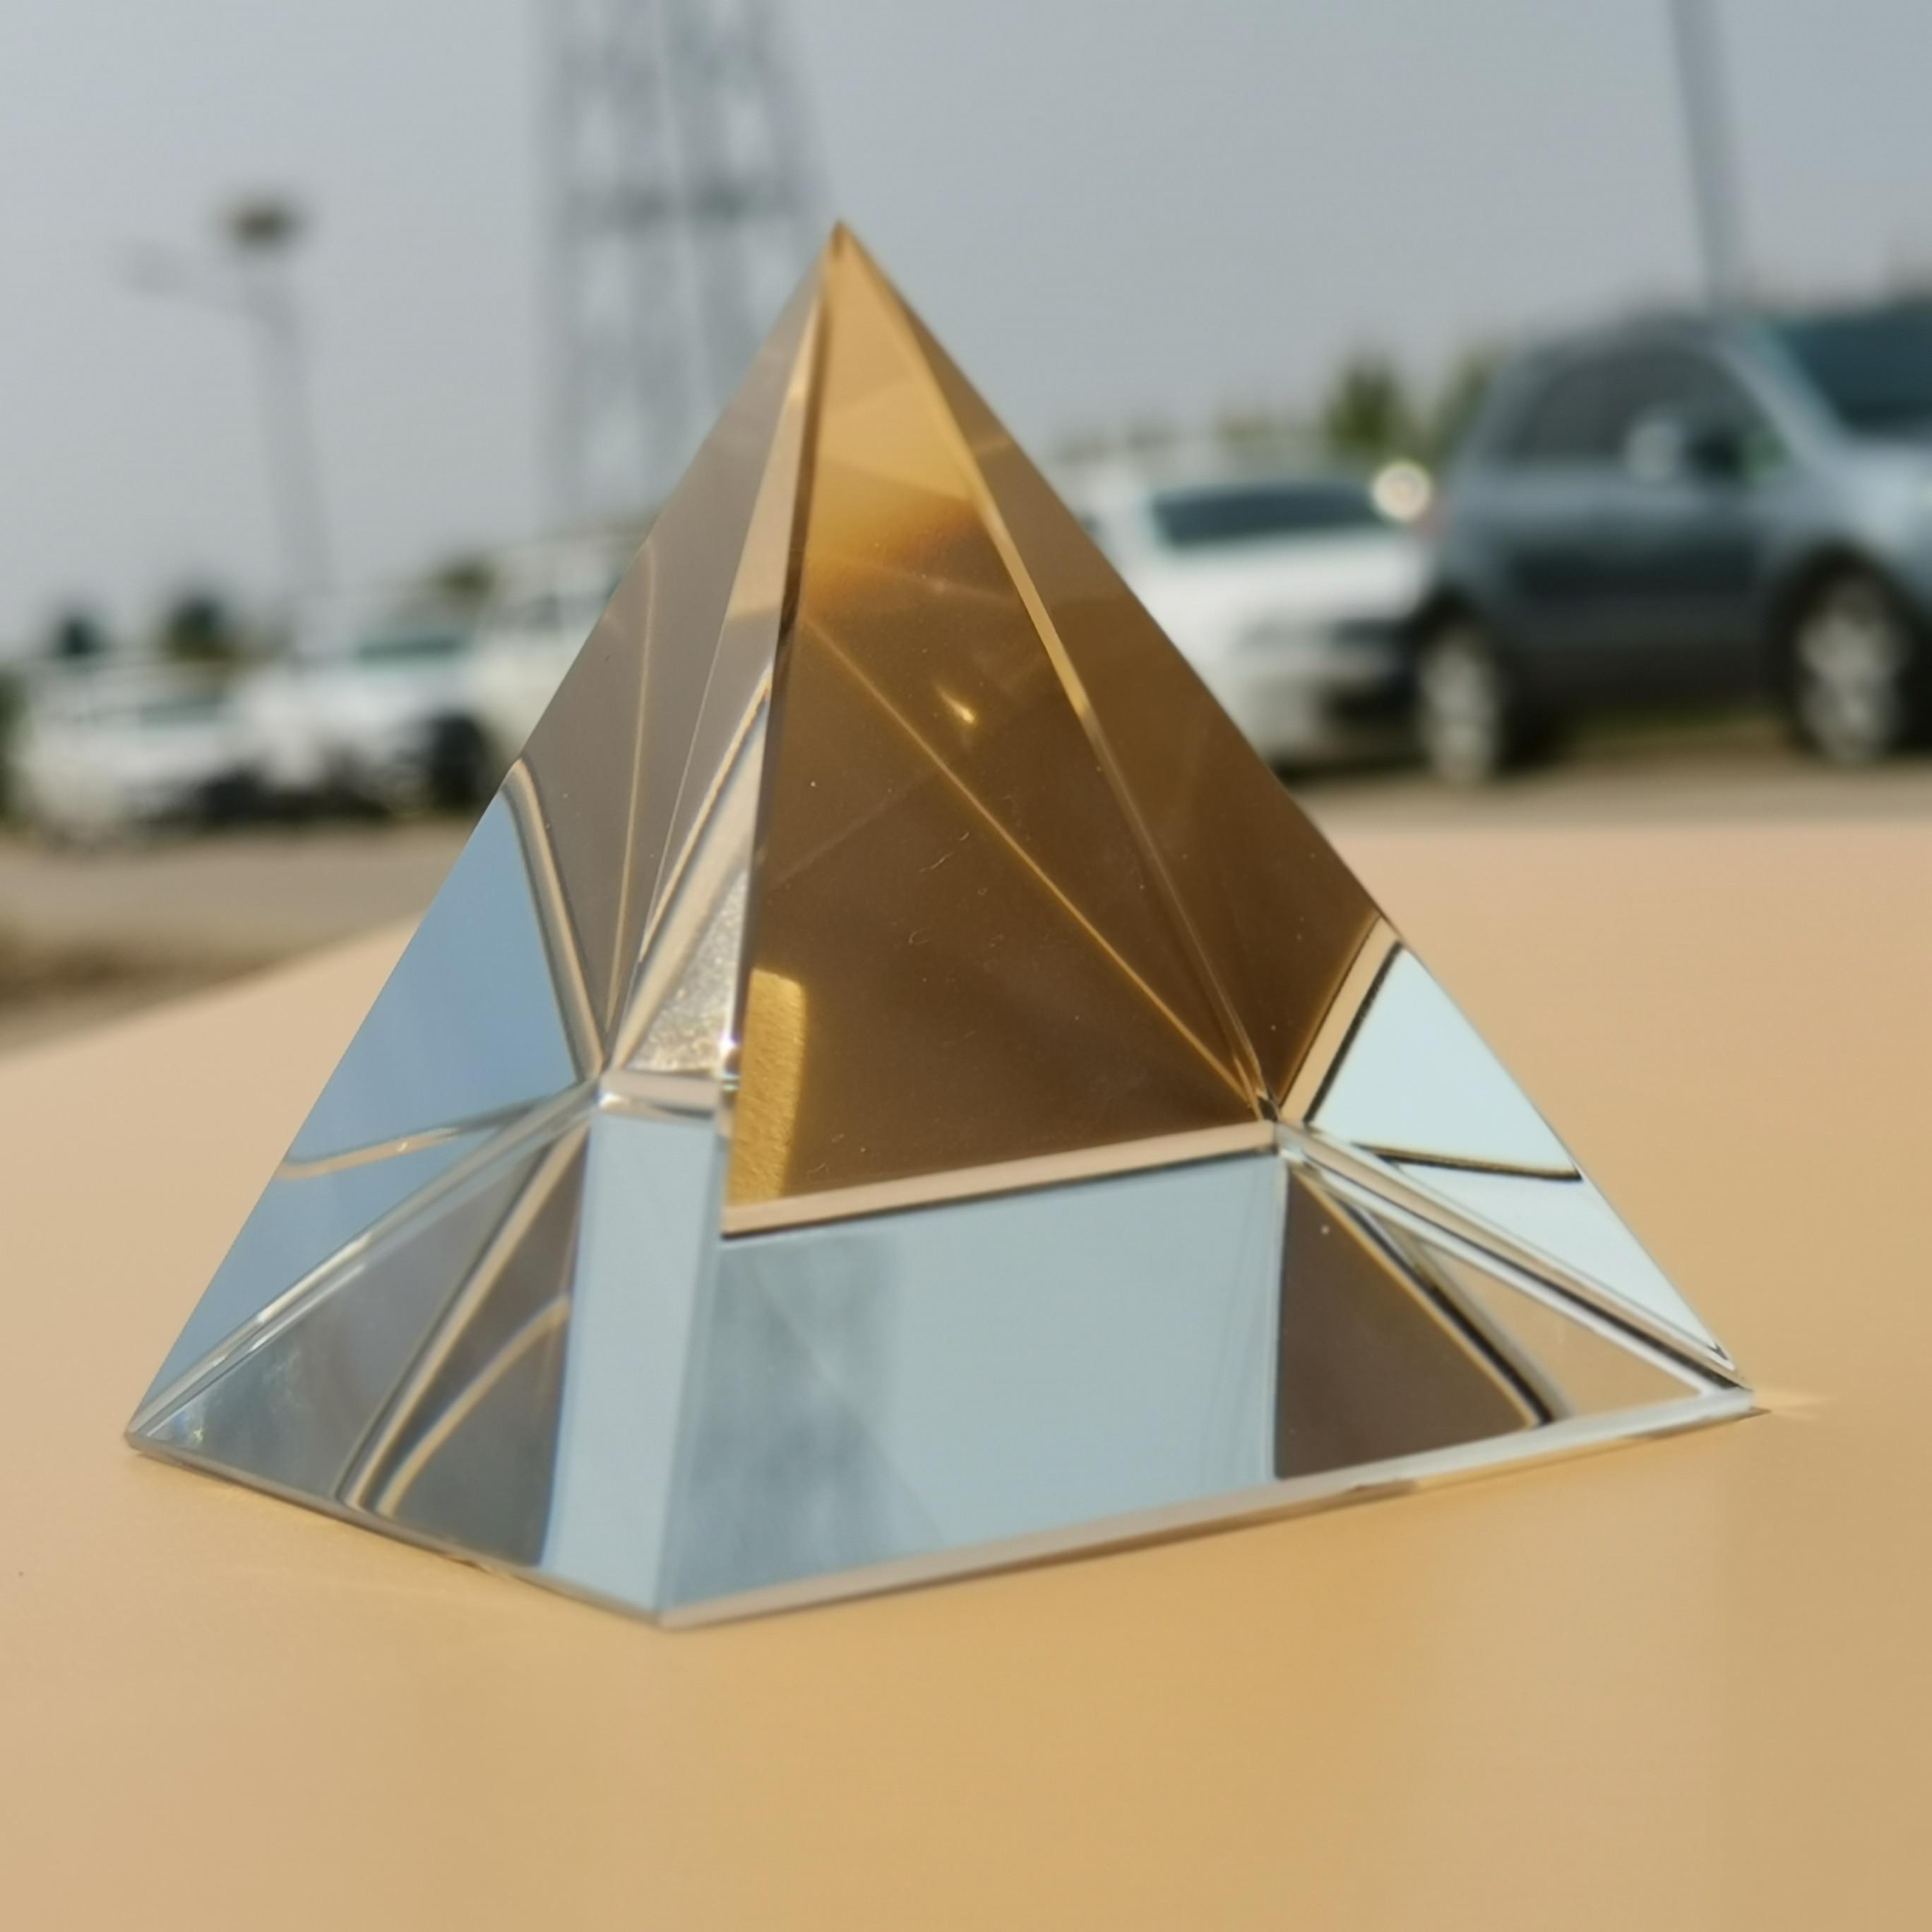 Optical Prism K9 Glass Pyramid Rainbow Crystal Photography Triangle Light Guide Science Optics Teaching SpectrumTools